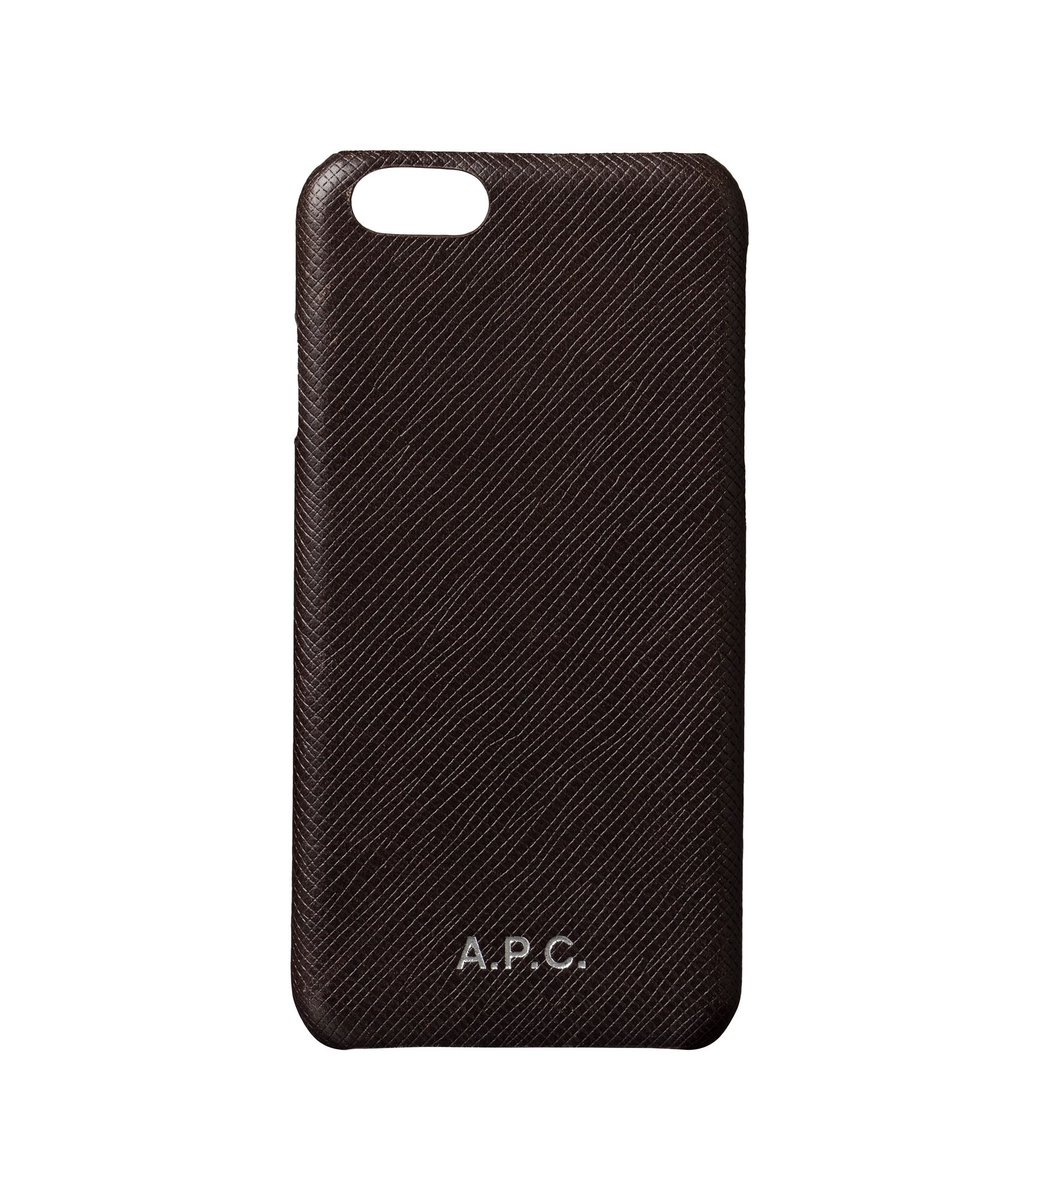 #APC 2017年 春夏コレクション iPhone 6 case / iPhone 6+ case https://t.co/dLJIGQoXOh https://t.co/E9eehuu7tS